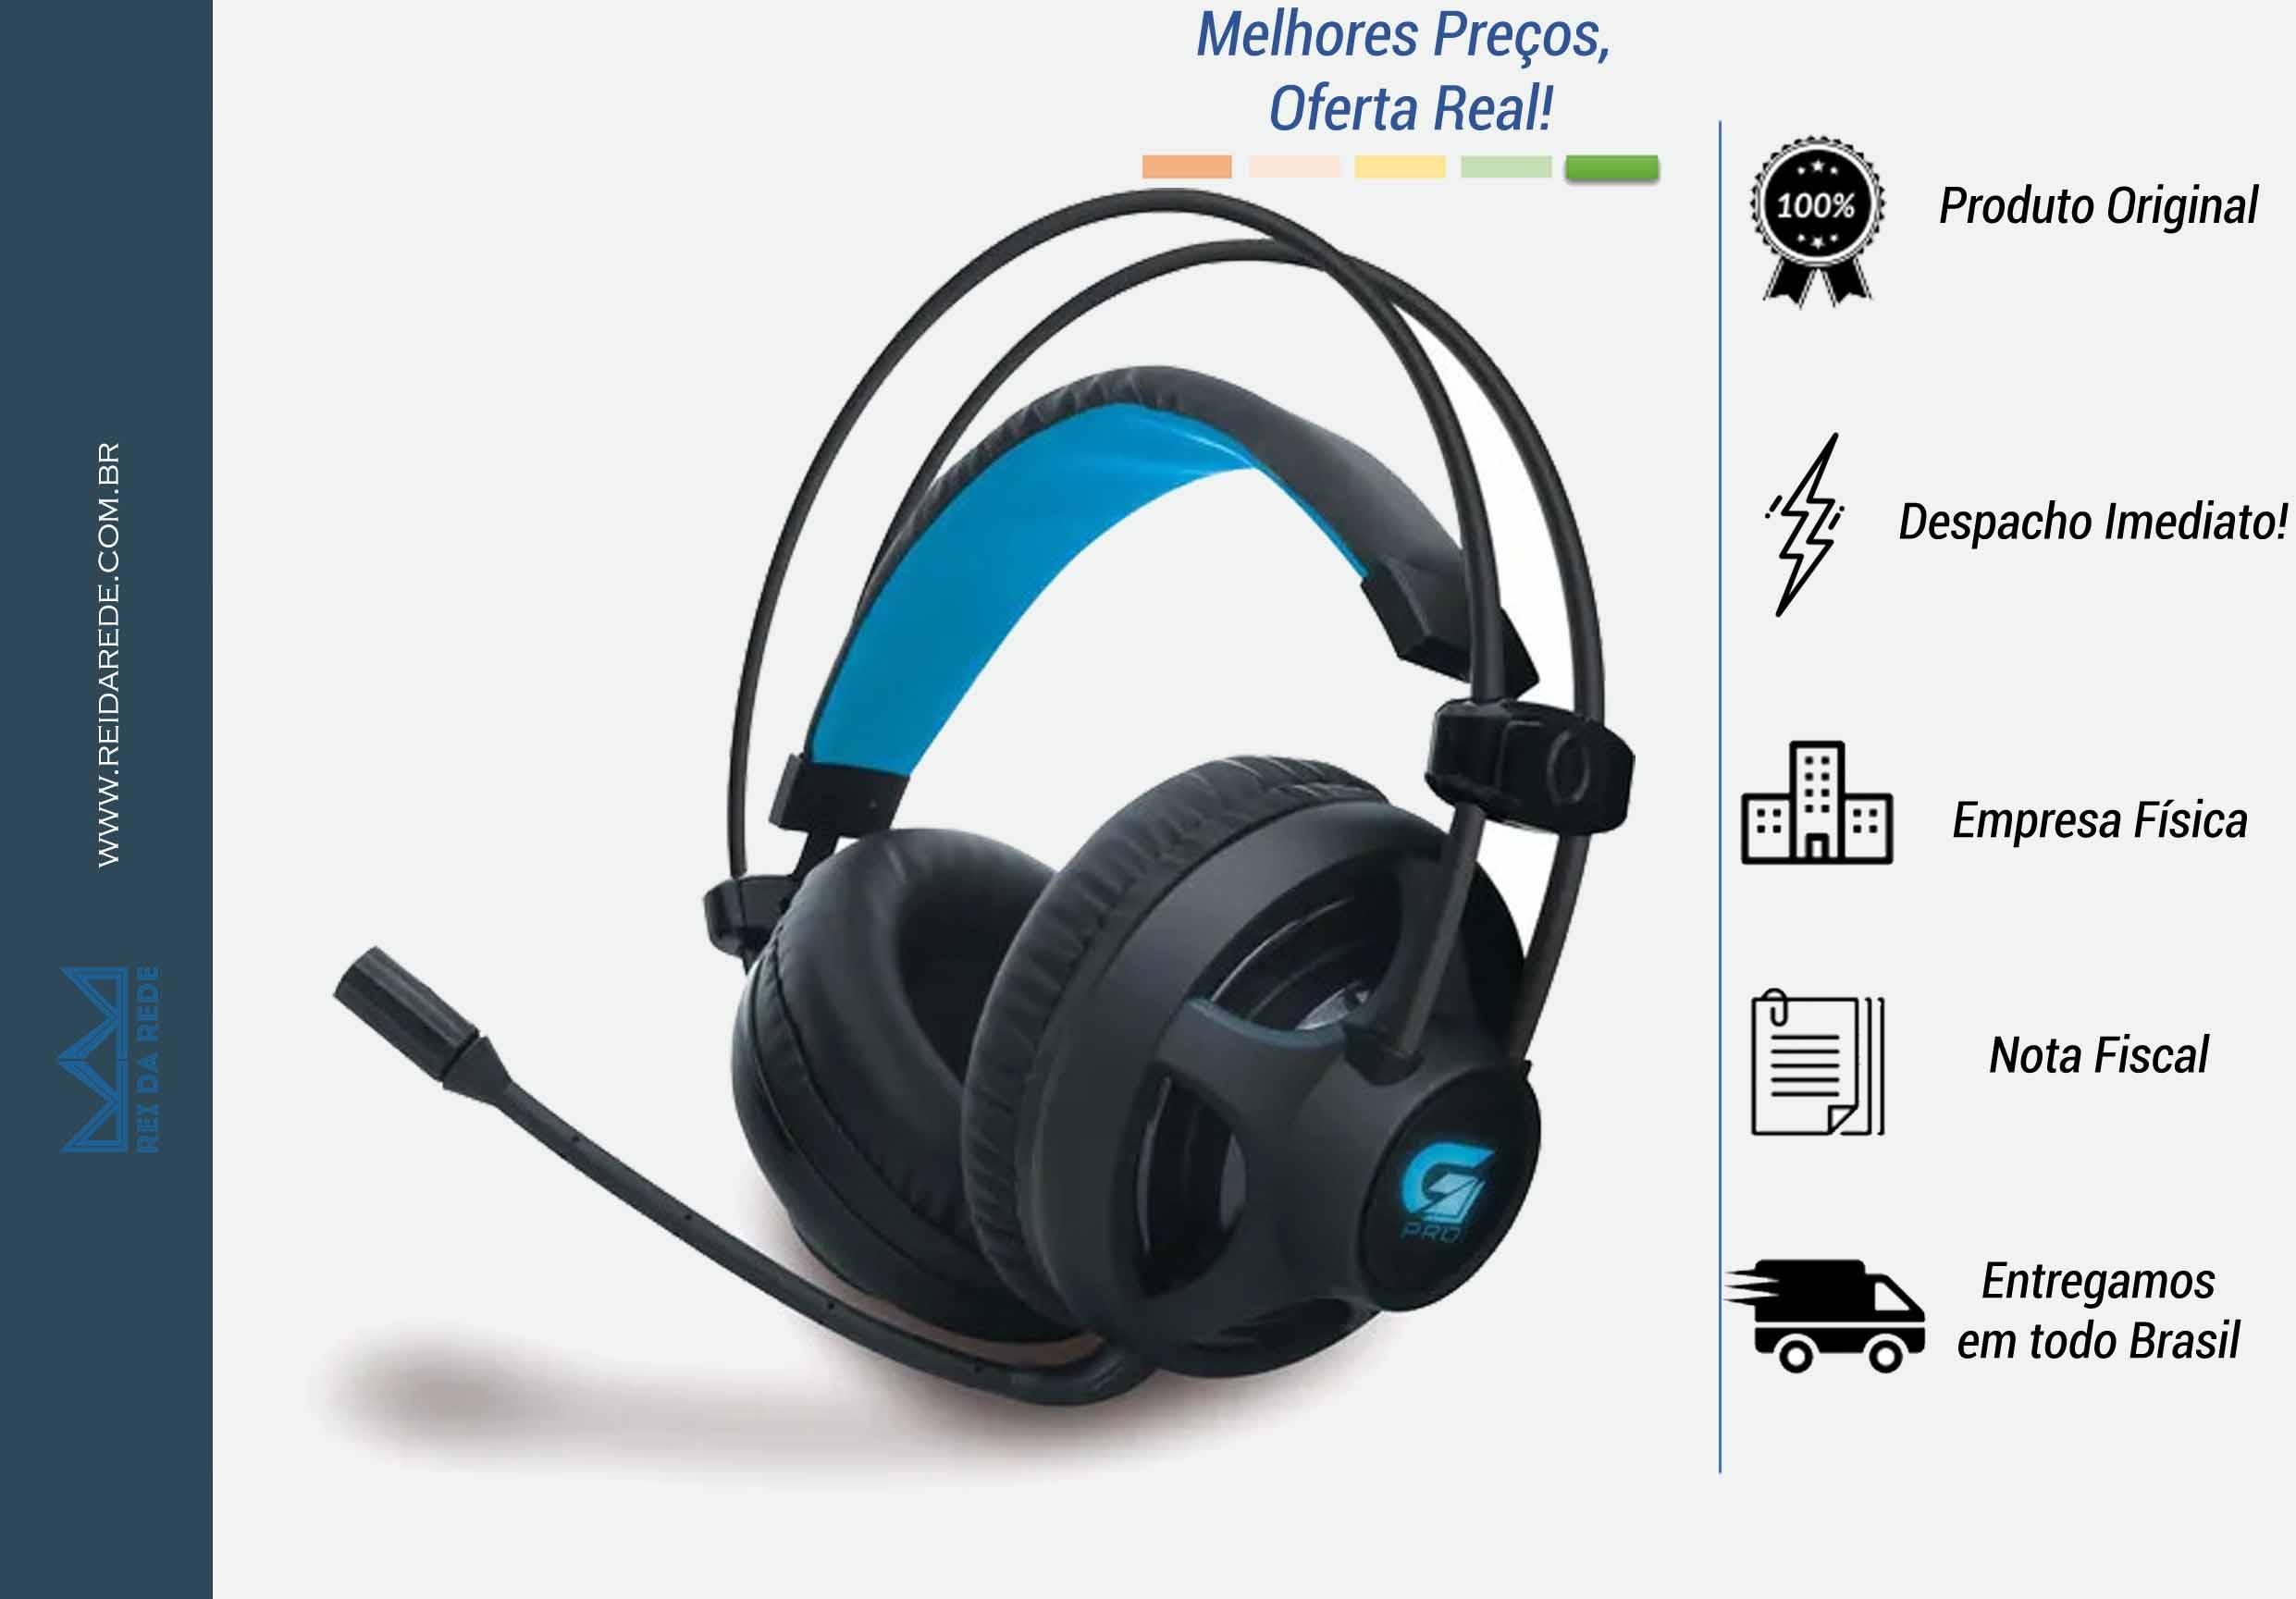 HEADSET GAMER PRO H2 COM LED AZUL PRETO P2/USB  - FORTREK